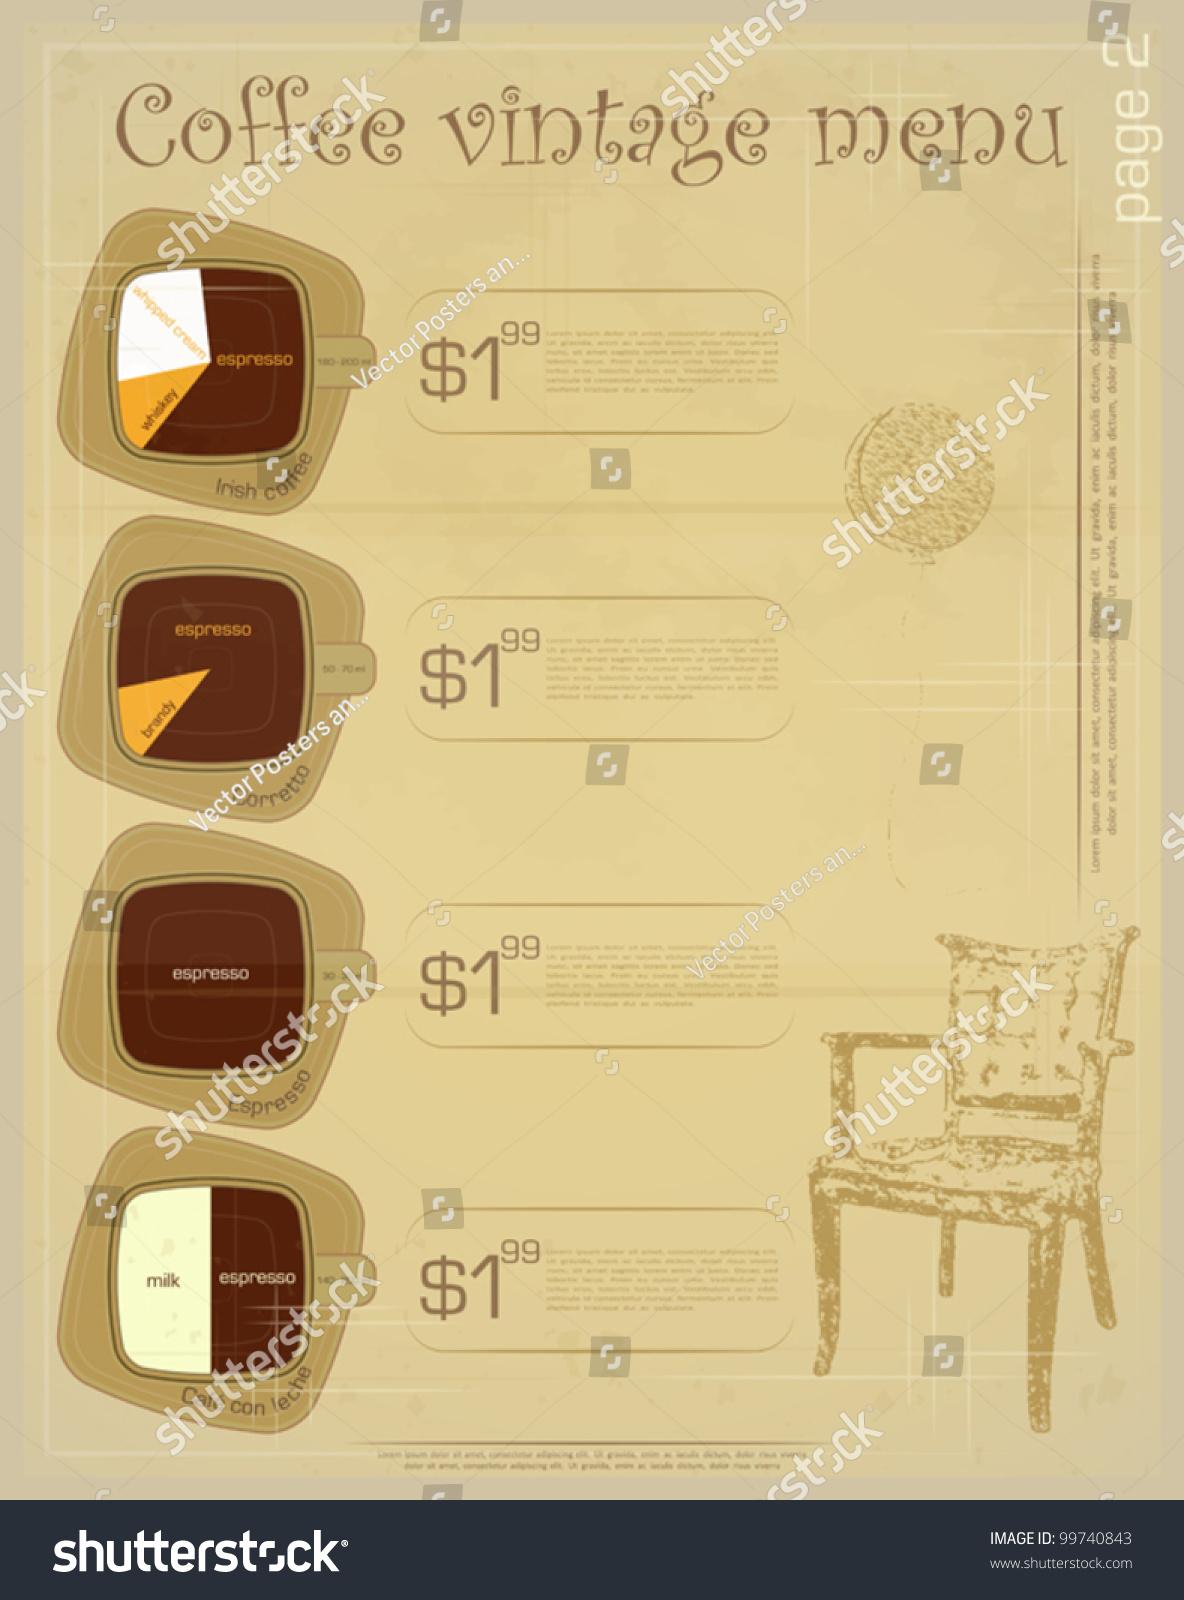 irish menu templates - template of menu for coffee drinks irish corretto